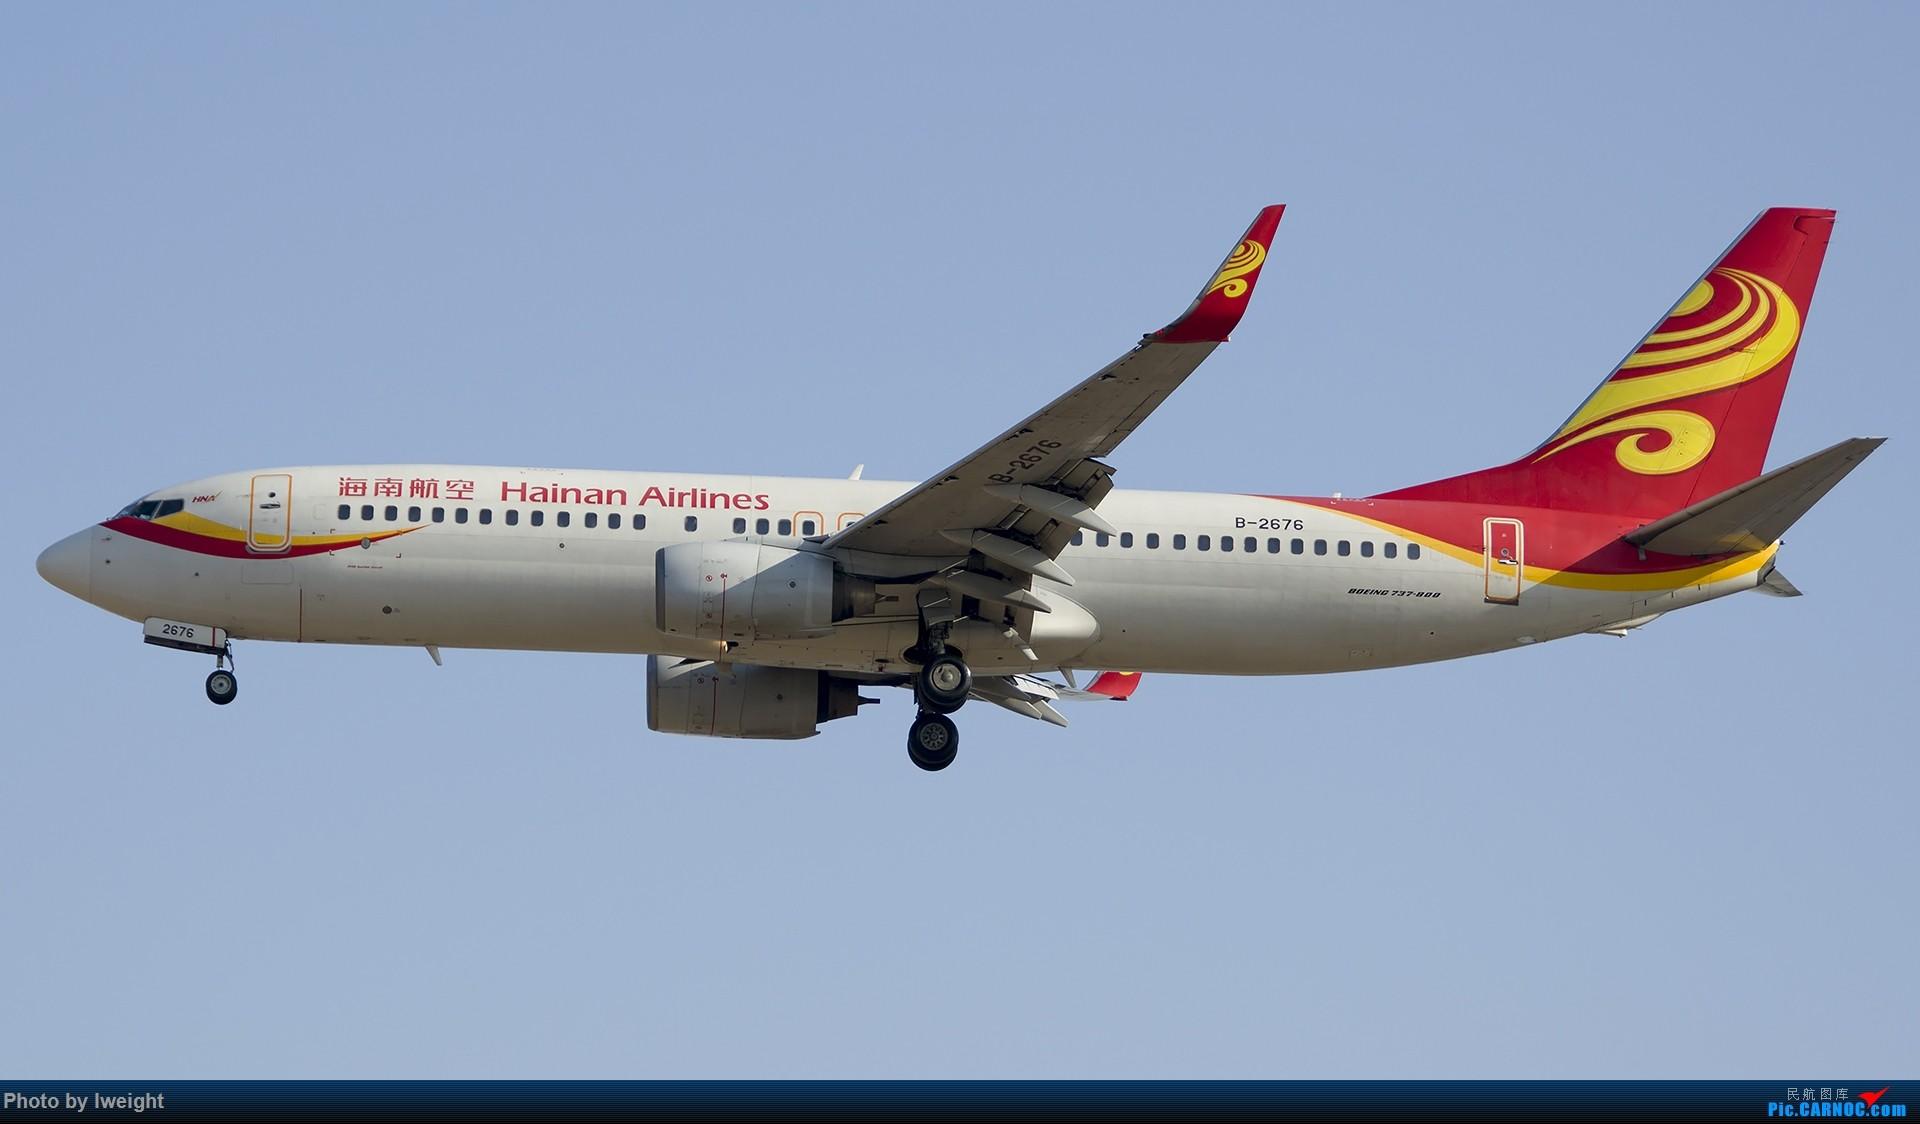 Re:[原创]庆祝升级777,发上今天在首都机场拍的所有飞机【2014-12-14】 BOEING 737-800 B-2676 中国北京首都国际机场